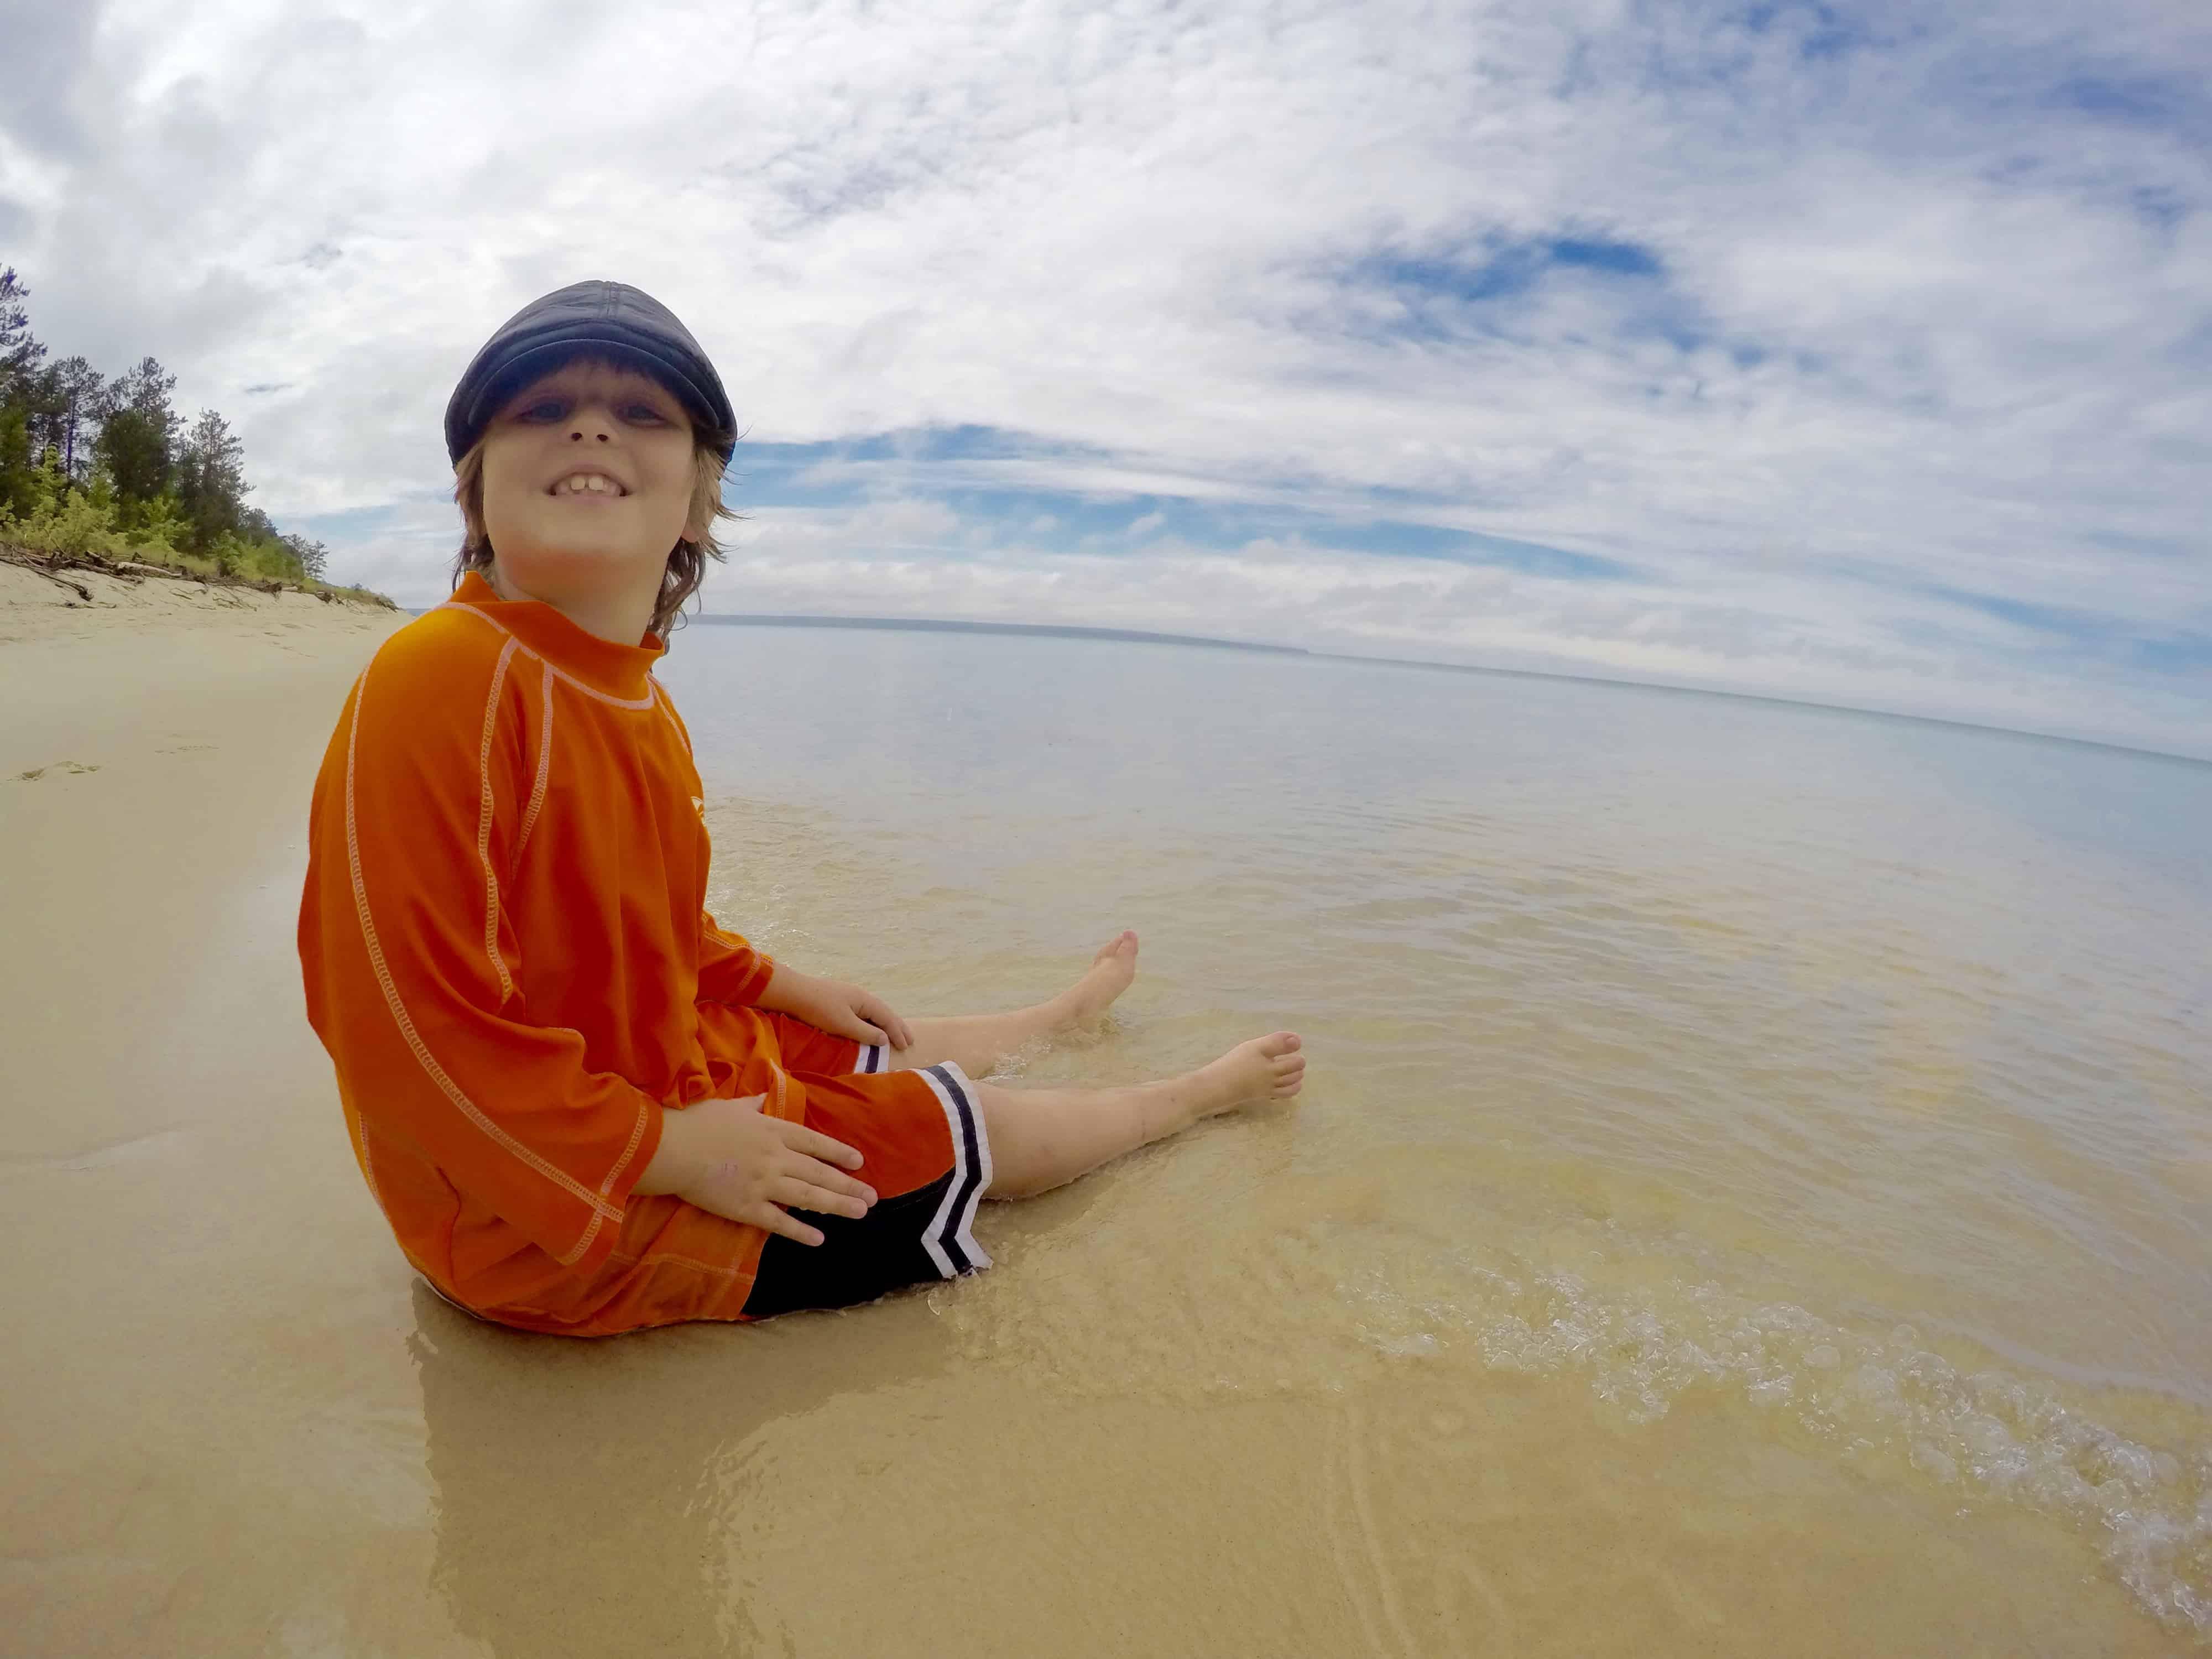 boy sitting on Miner's Beach in Michigan on Lake Superior